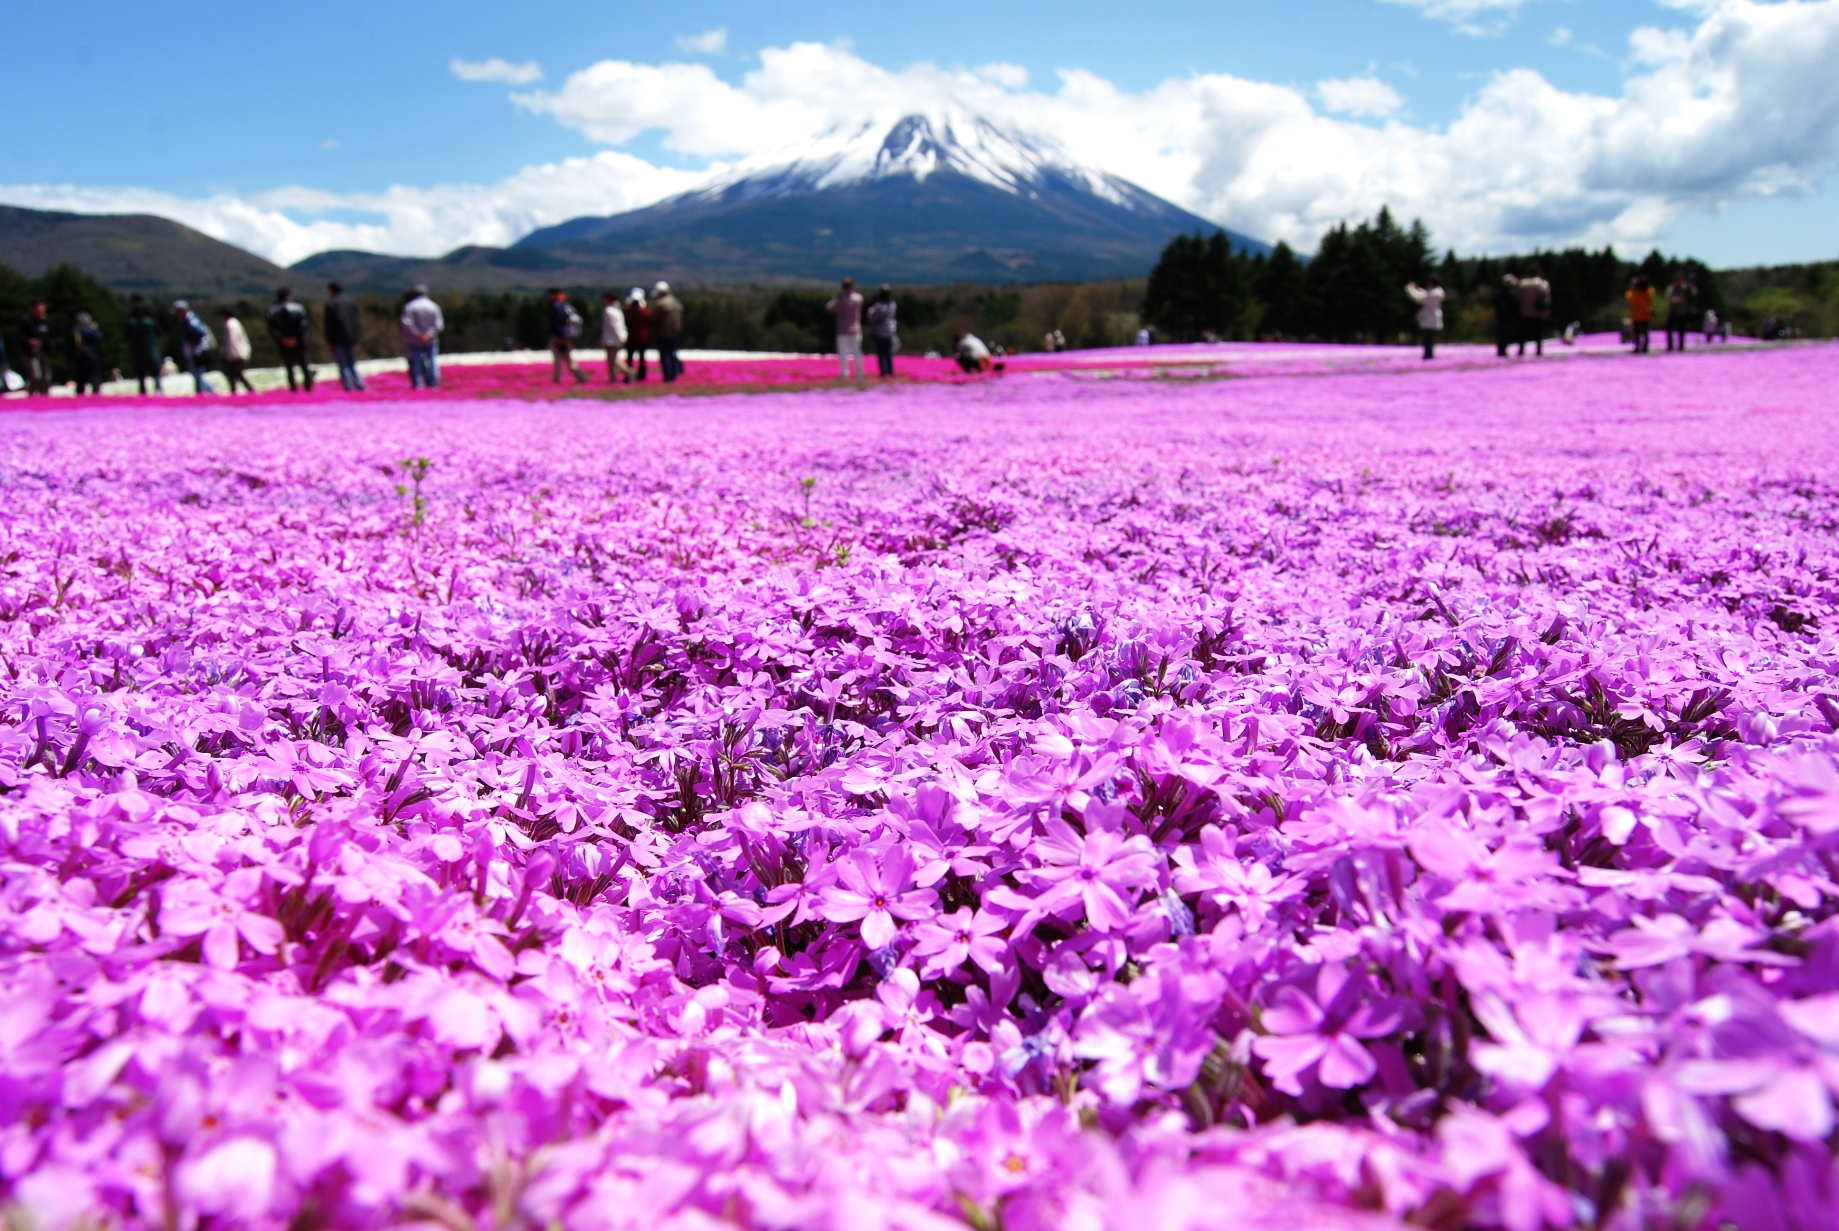 「富士芝桜 フリー写真」の画像検索結果